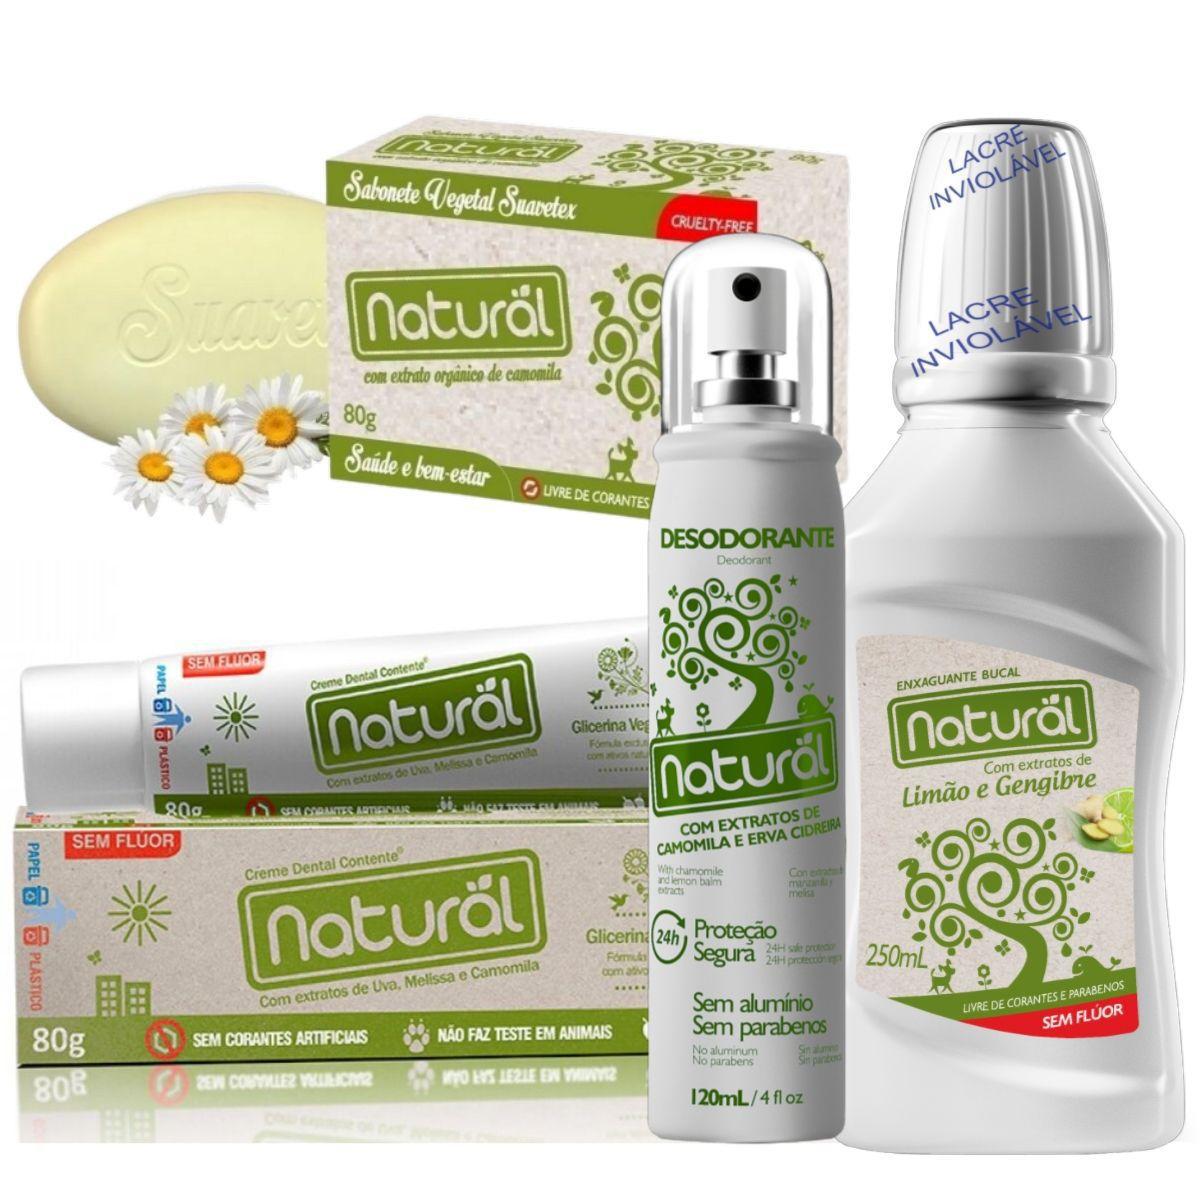 Kit Creme Dental 80g + Desodorante Spray 120ml + Enxaguante Bucal 250ml + Sabonete Orgânico de Camomila 80gr - Orgânico Natural